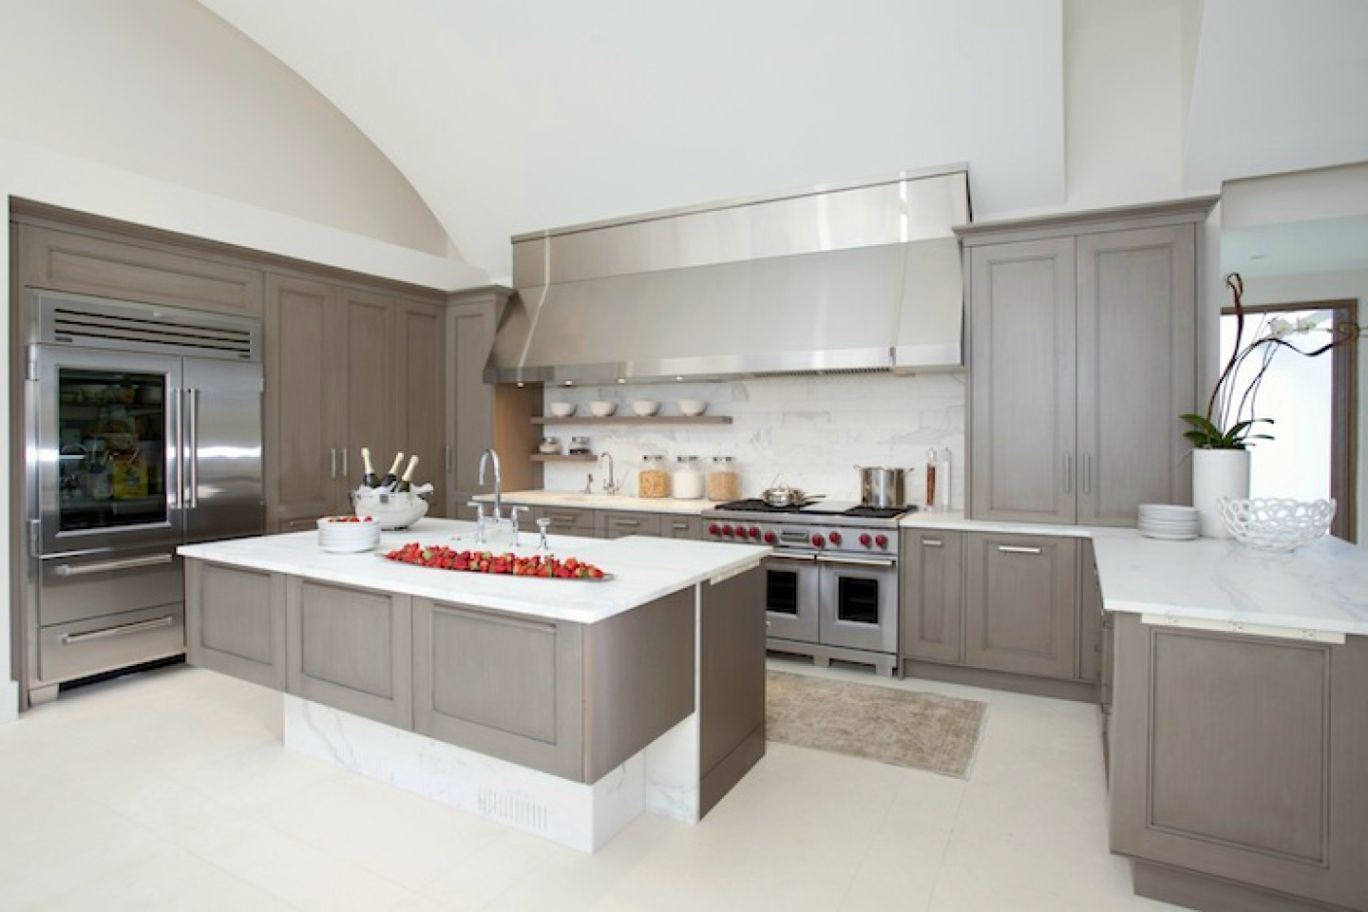 Superb Gray Kitchen Cabinet Designs - White and grey kitchen cupboards